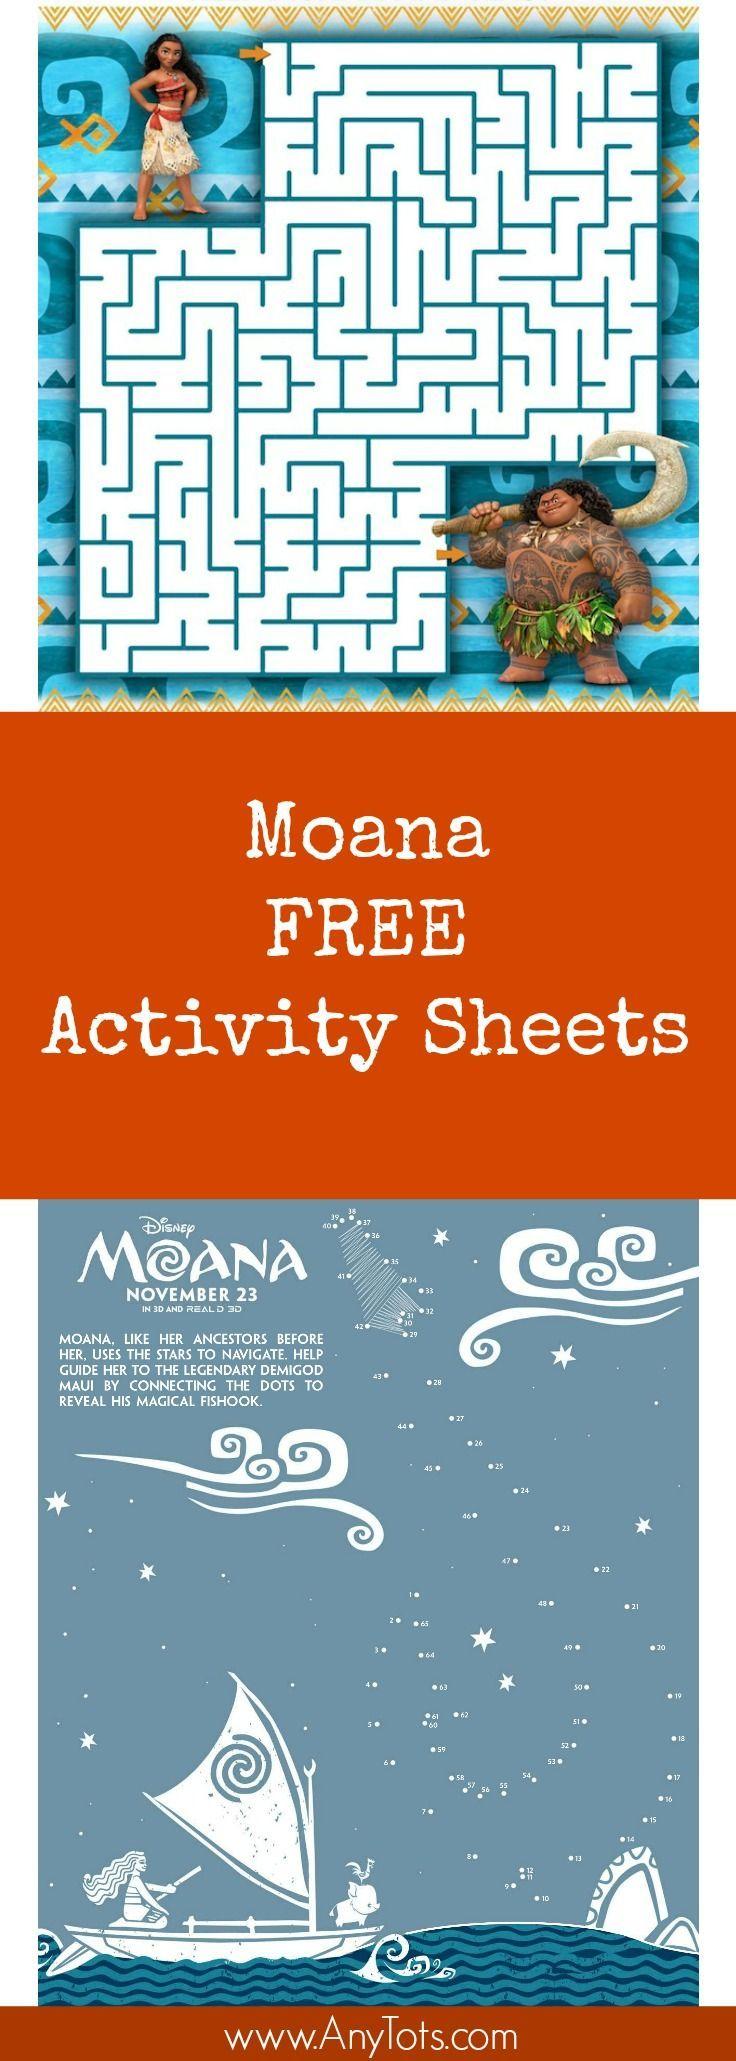 Free Printable: Moana Coloring and Activity Sheets | Pinterest ...